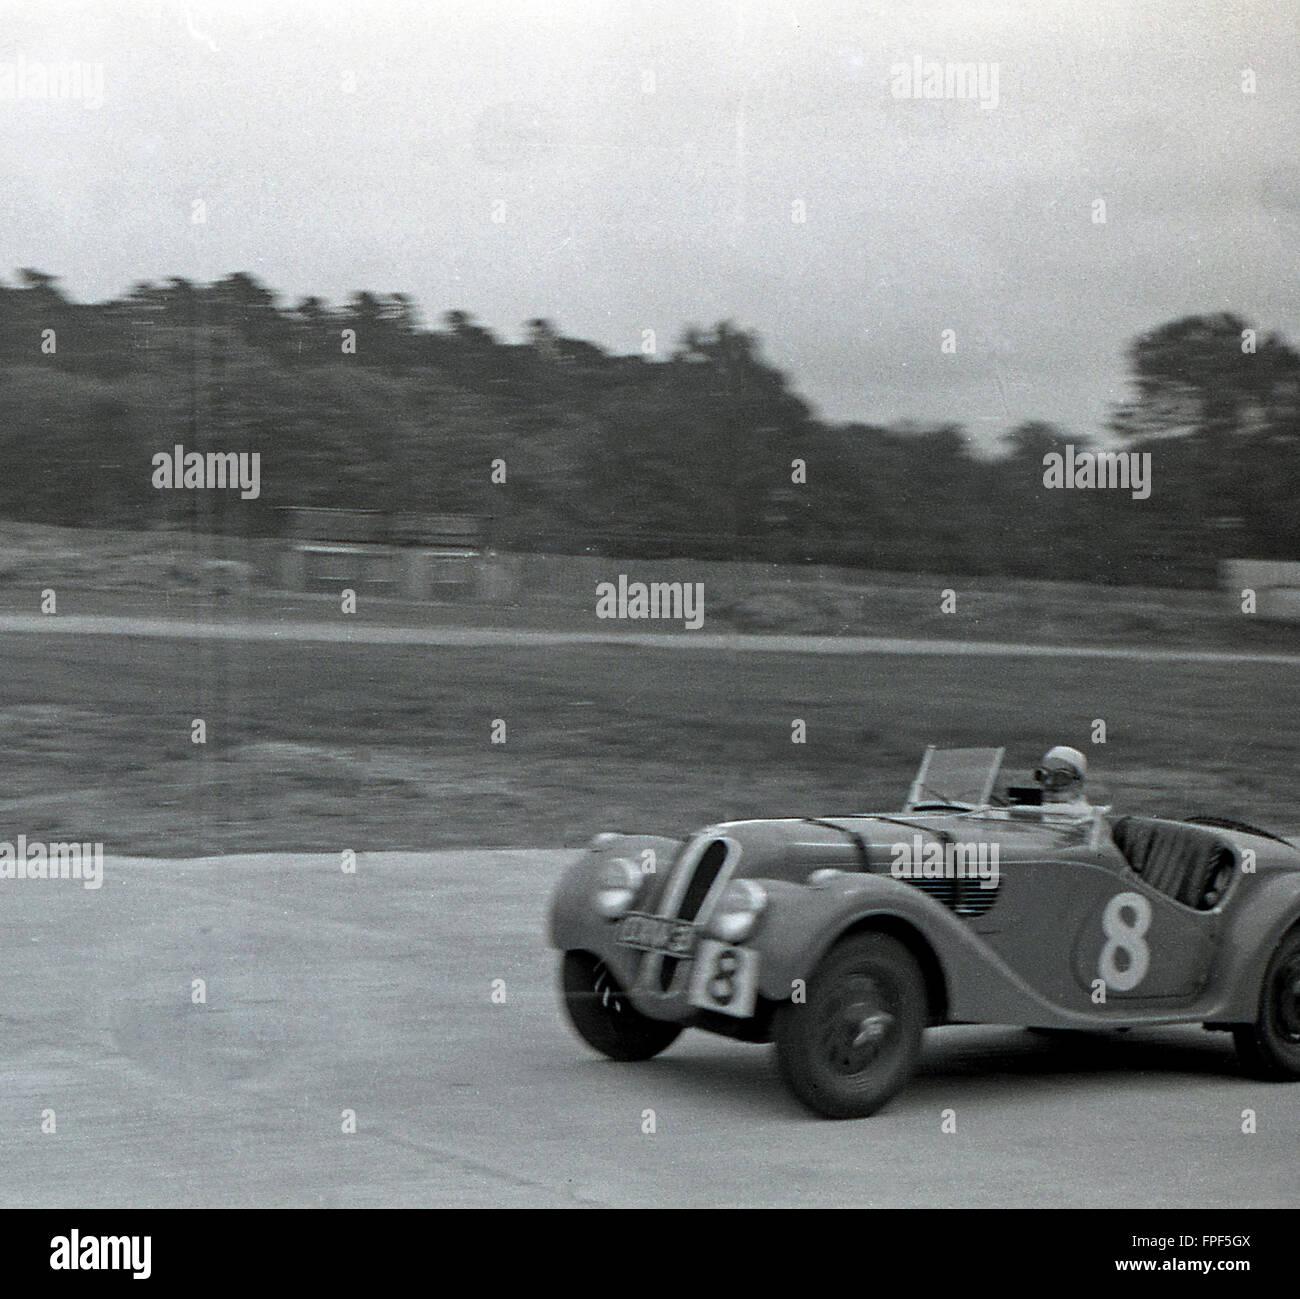 1930s historical, No 8 motor racing car goes round Brooklands race track, Weybridge, Surrey. Opened in 1907, the - Stock Image